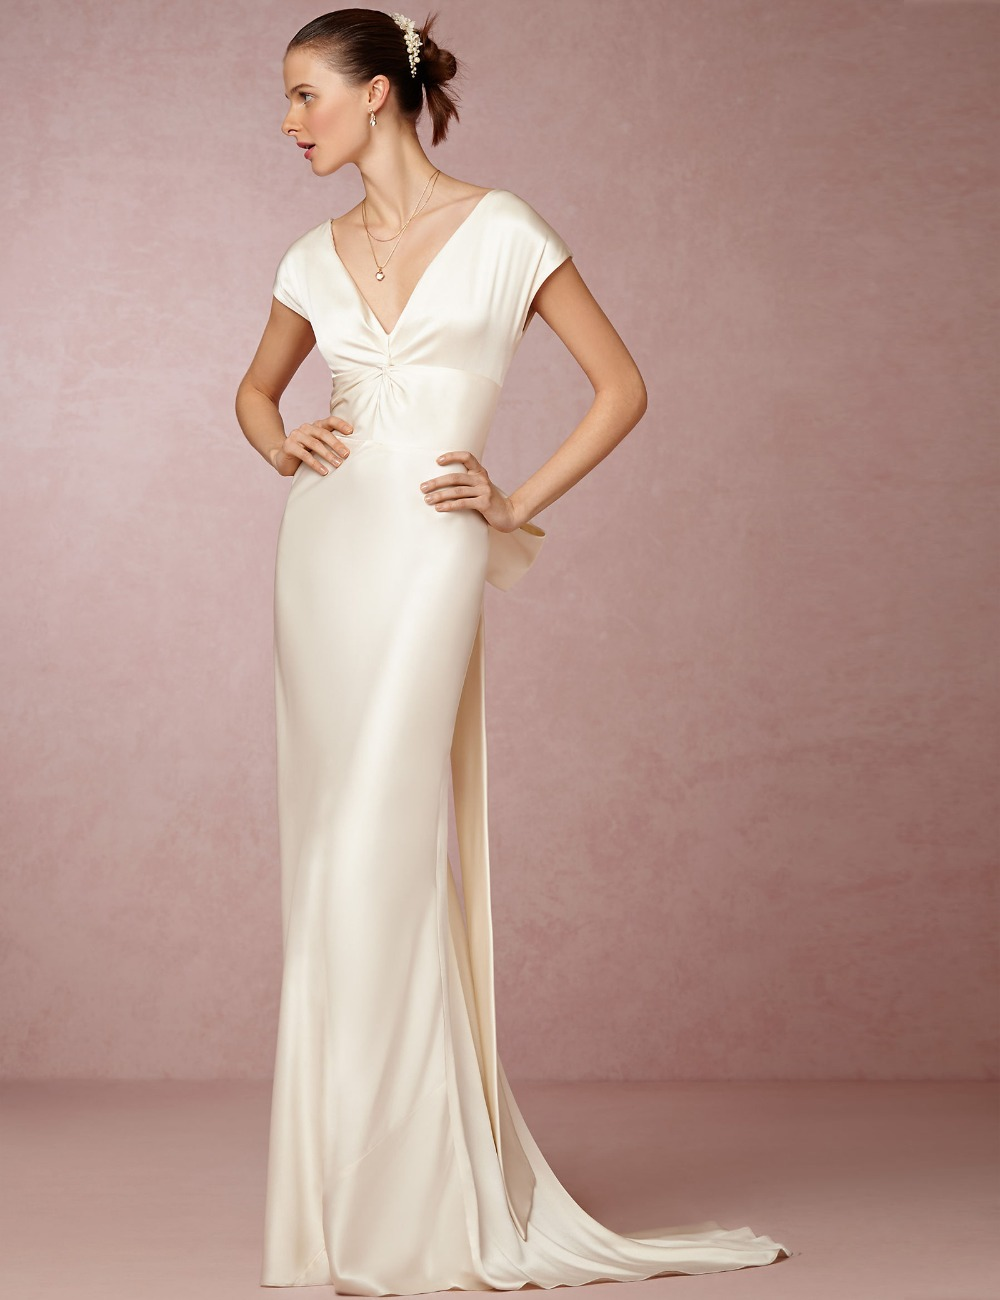 aliexpress wedding dresses Aliexpress com Buy Sexy Evening Celebrity Dresses Mini Miranda Kerr hi low Chiffon V Neck Cap Sleeves